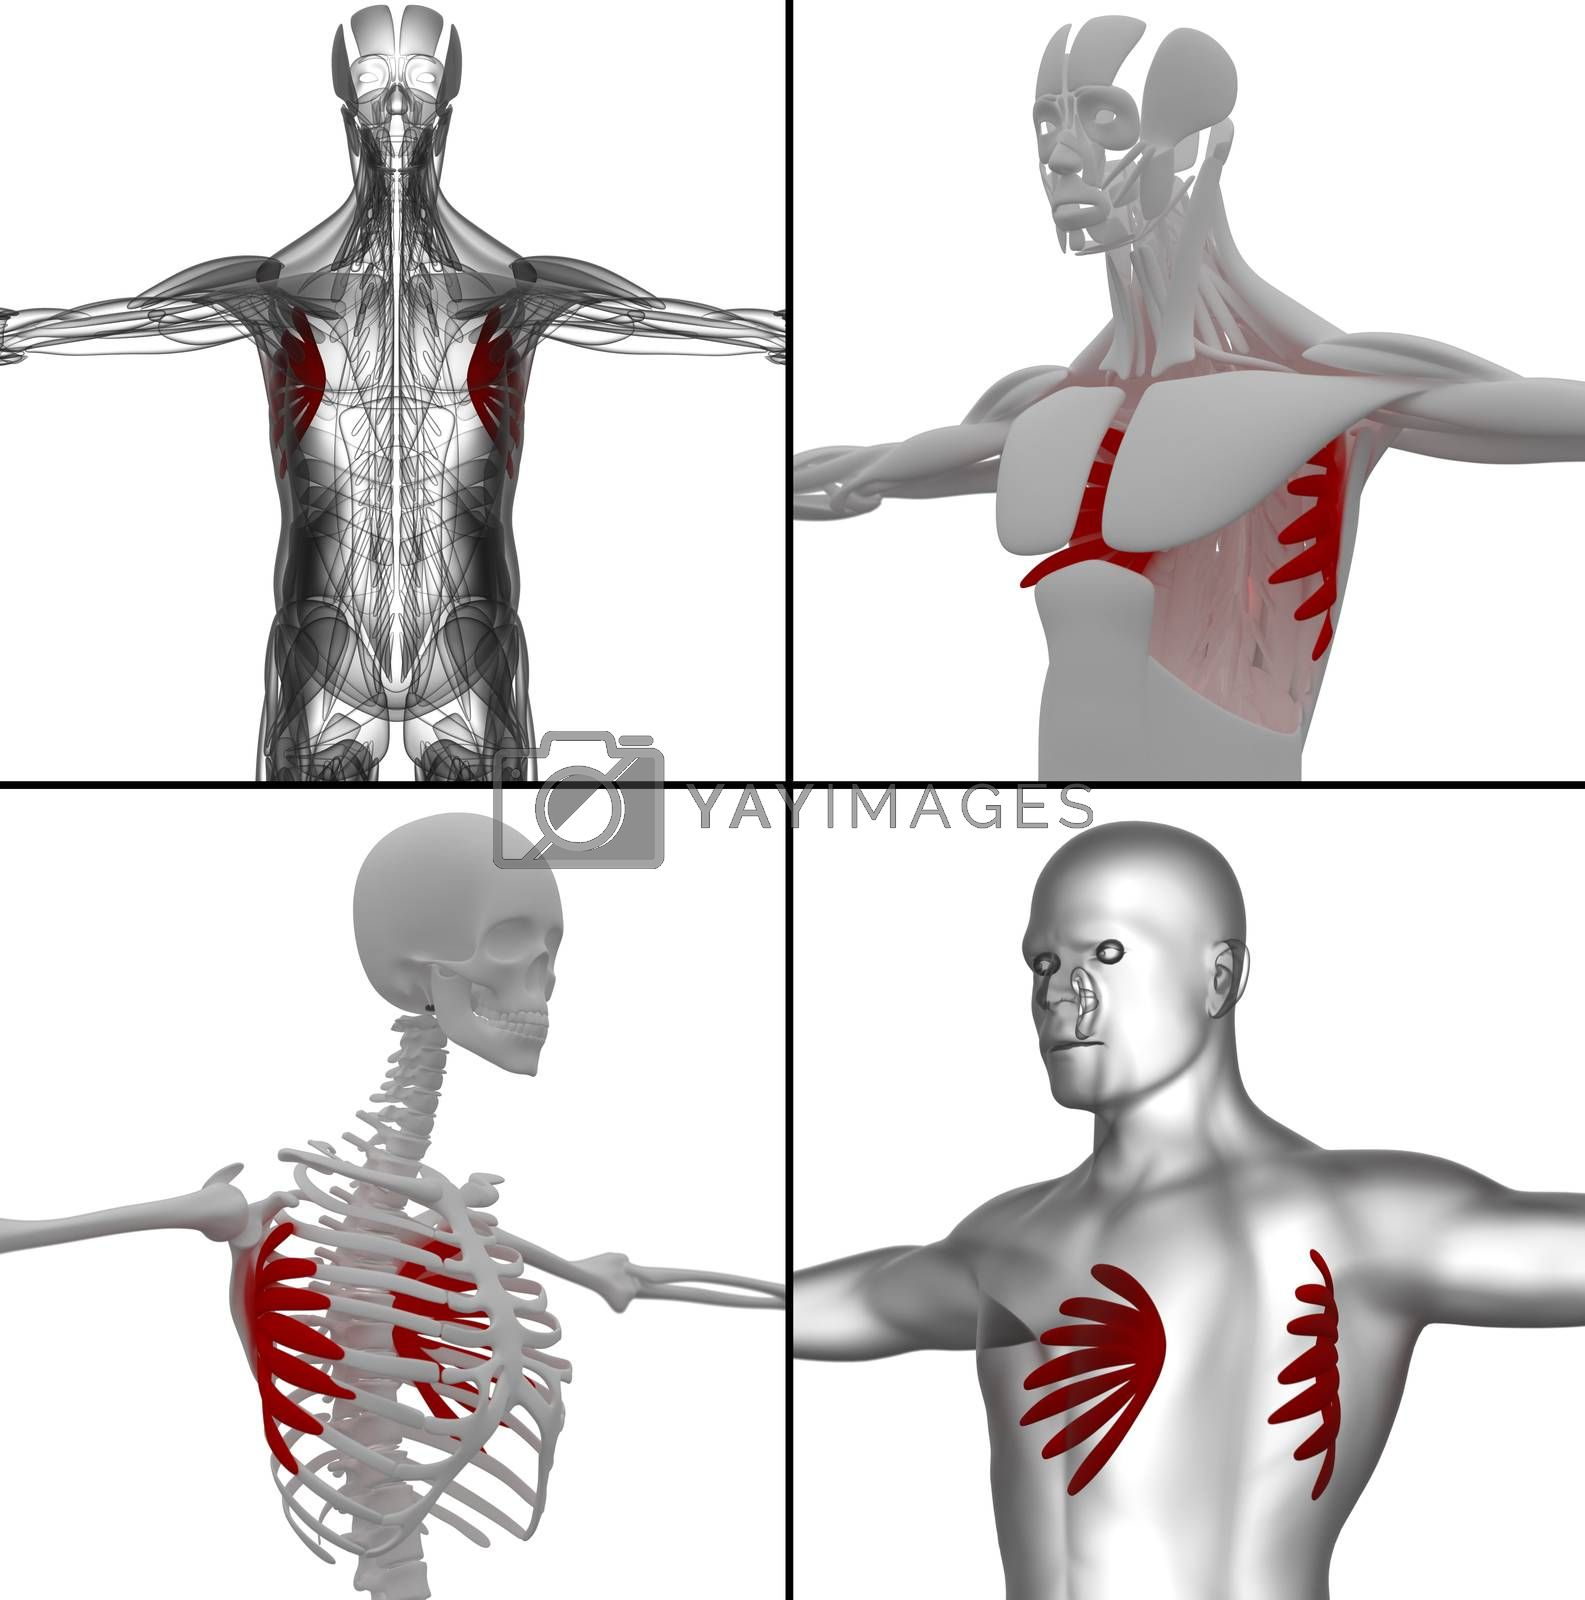 Royalty free image of medical illustration of the serratus anterior by maya2008